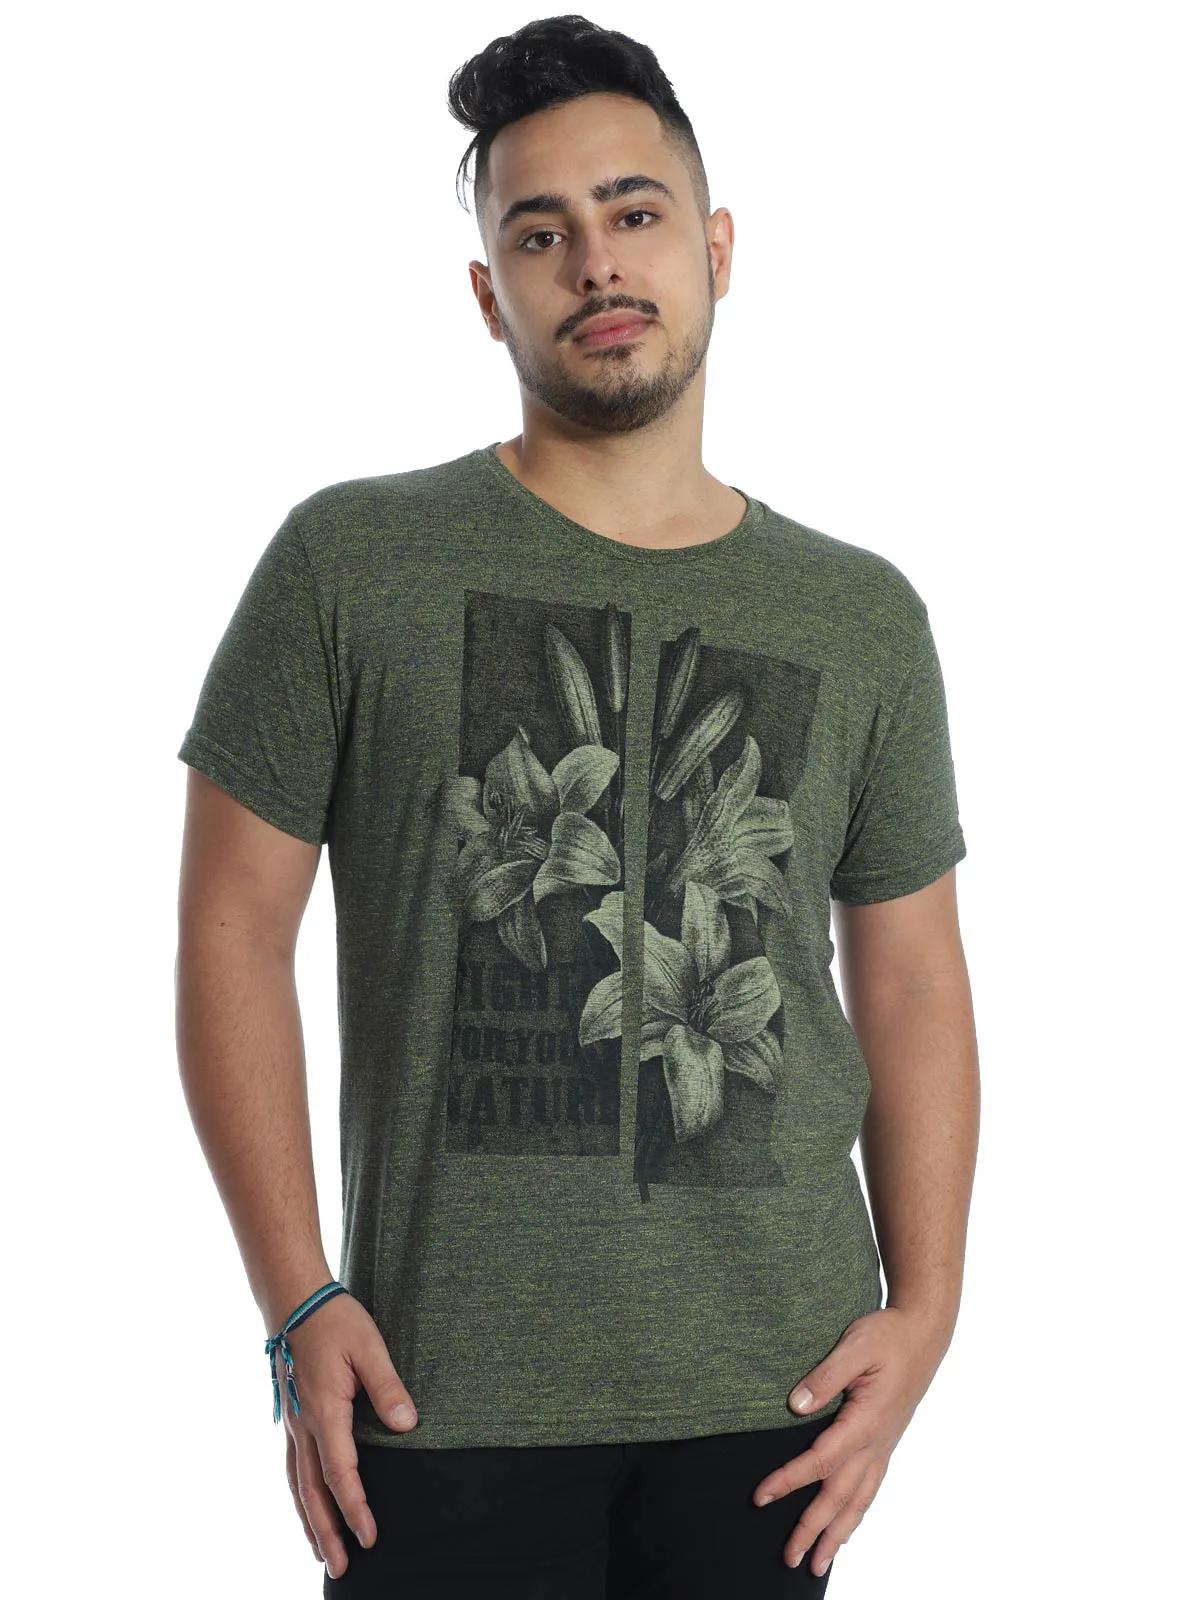 Camiseta Masculina Slim Fit Manga Curta Estampada Granite Verde